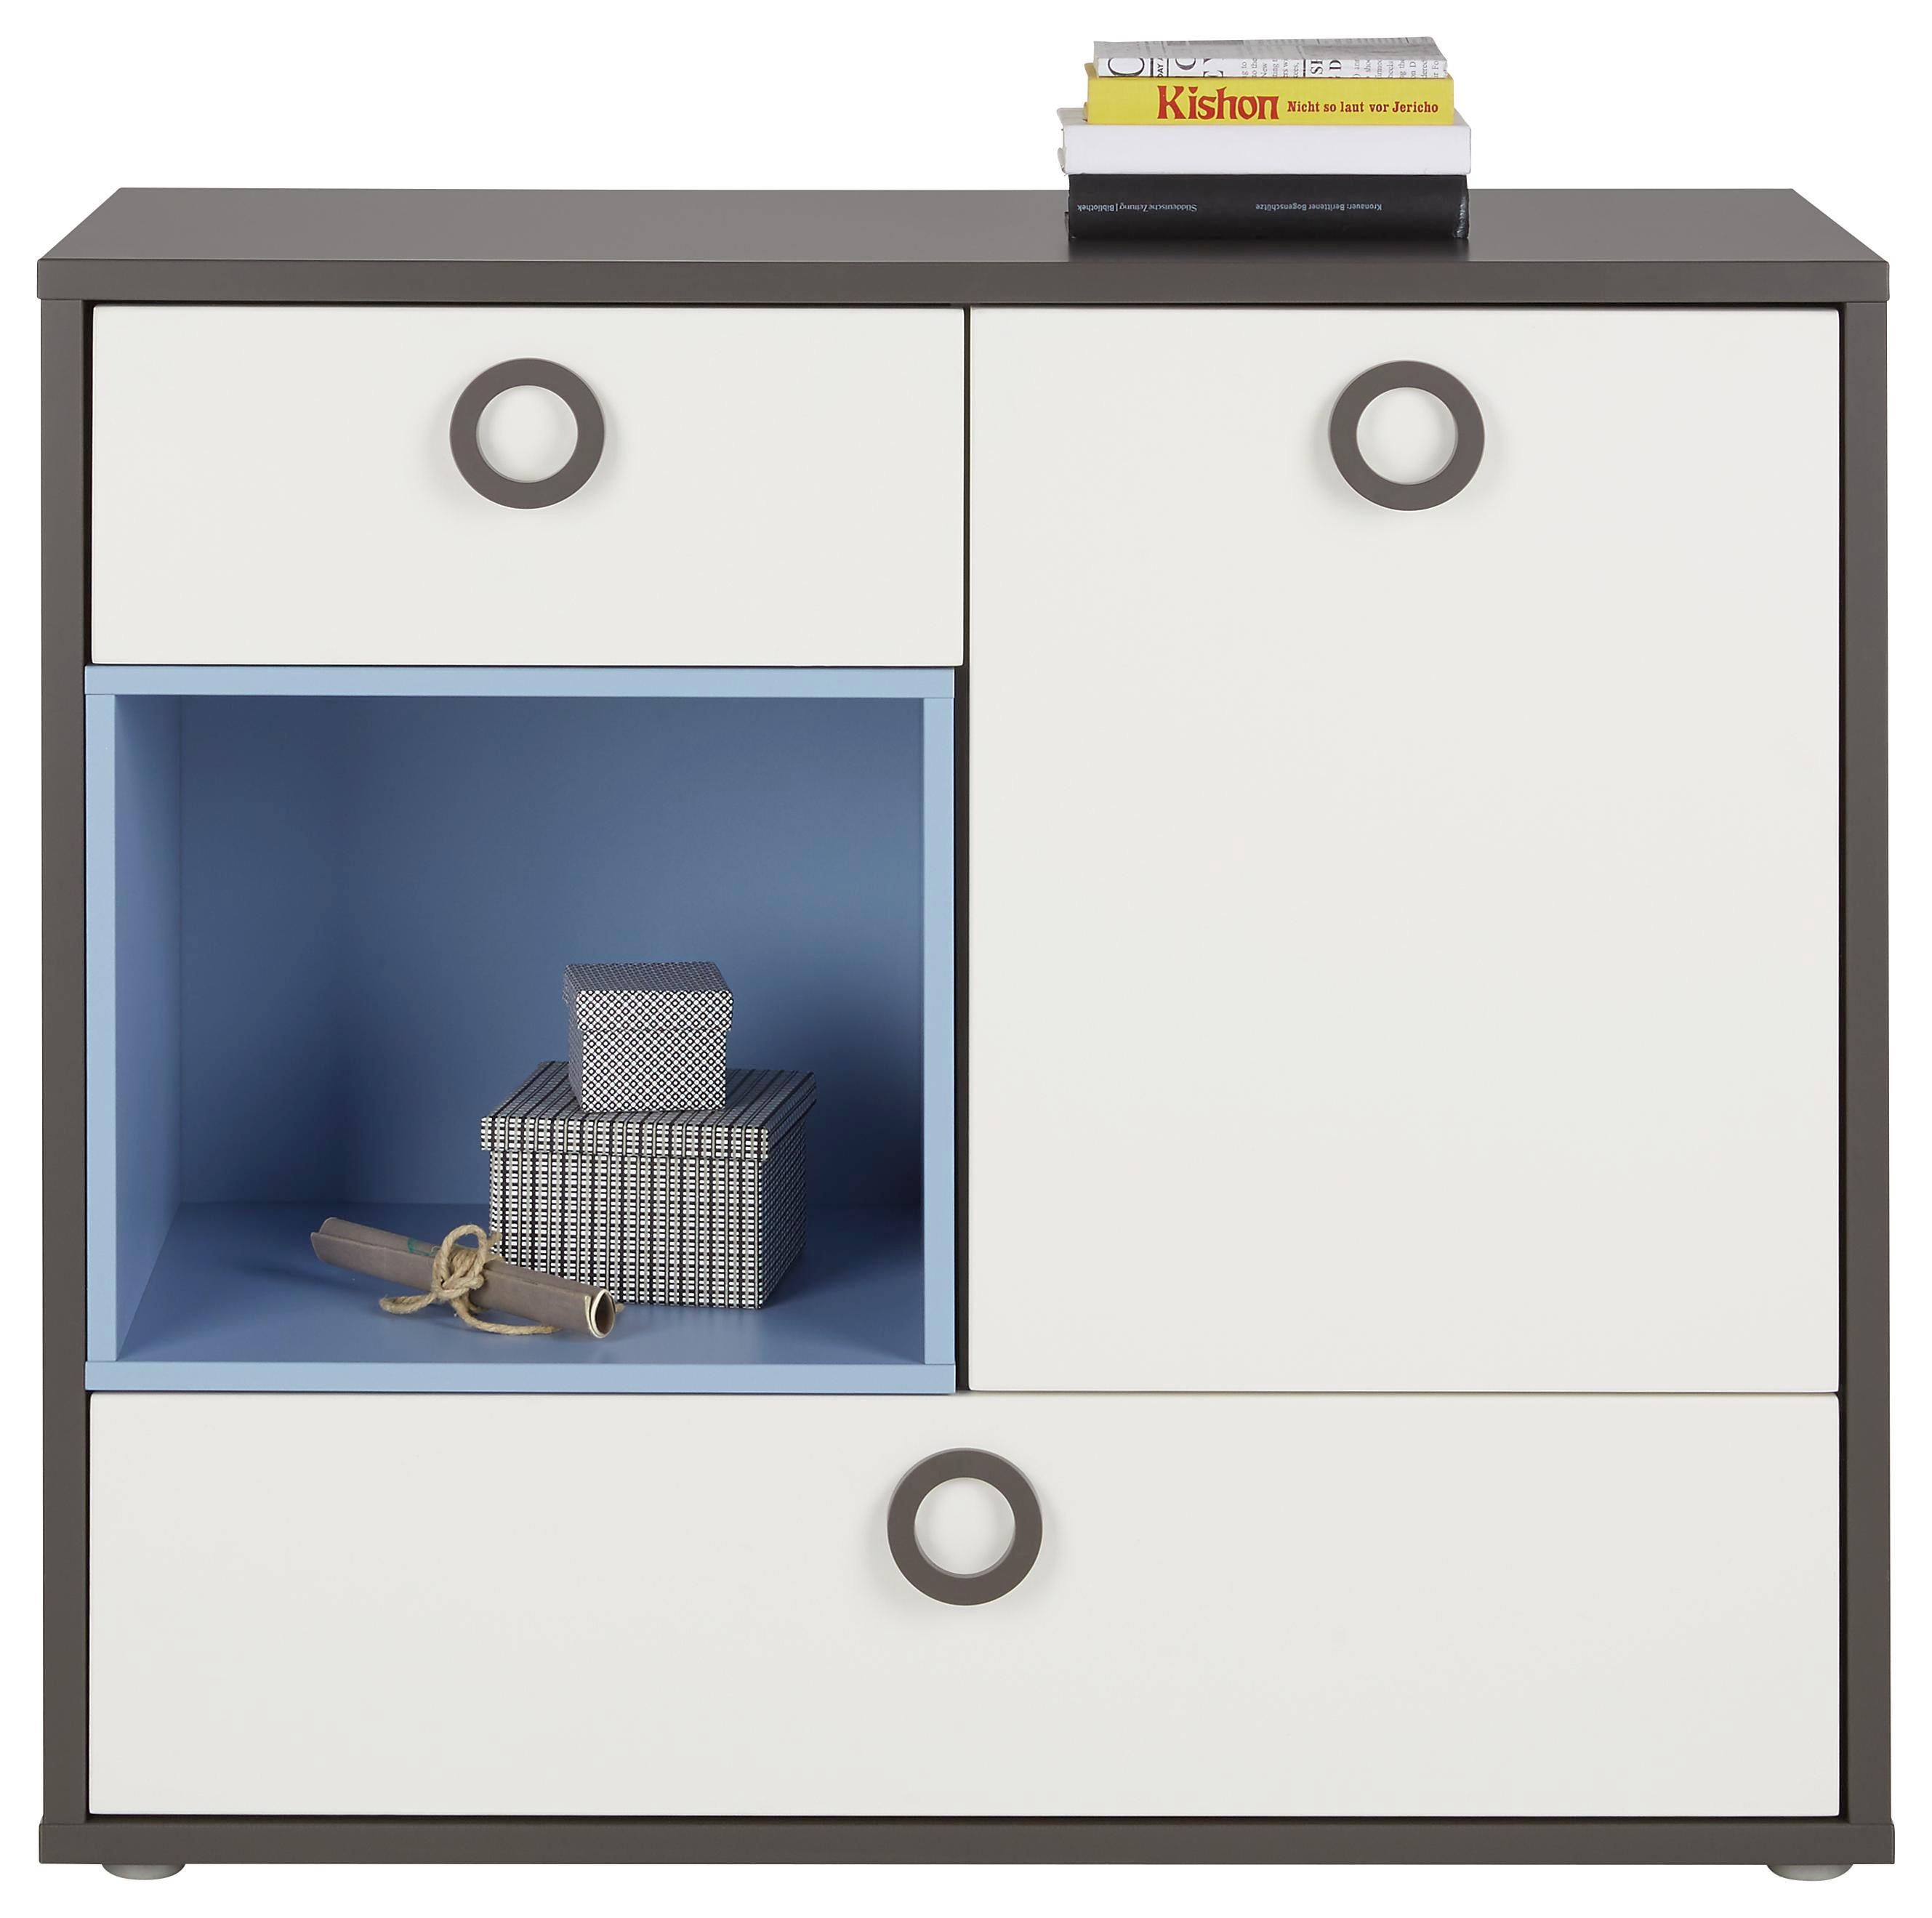 Kommode in Weiß/Grau/blau - Blau/Alufarben, KONVENTIONELL, Holzwerkstoff/Kunststoff (95/87/42cm) - MODERN LIVING